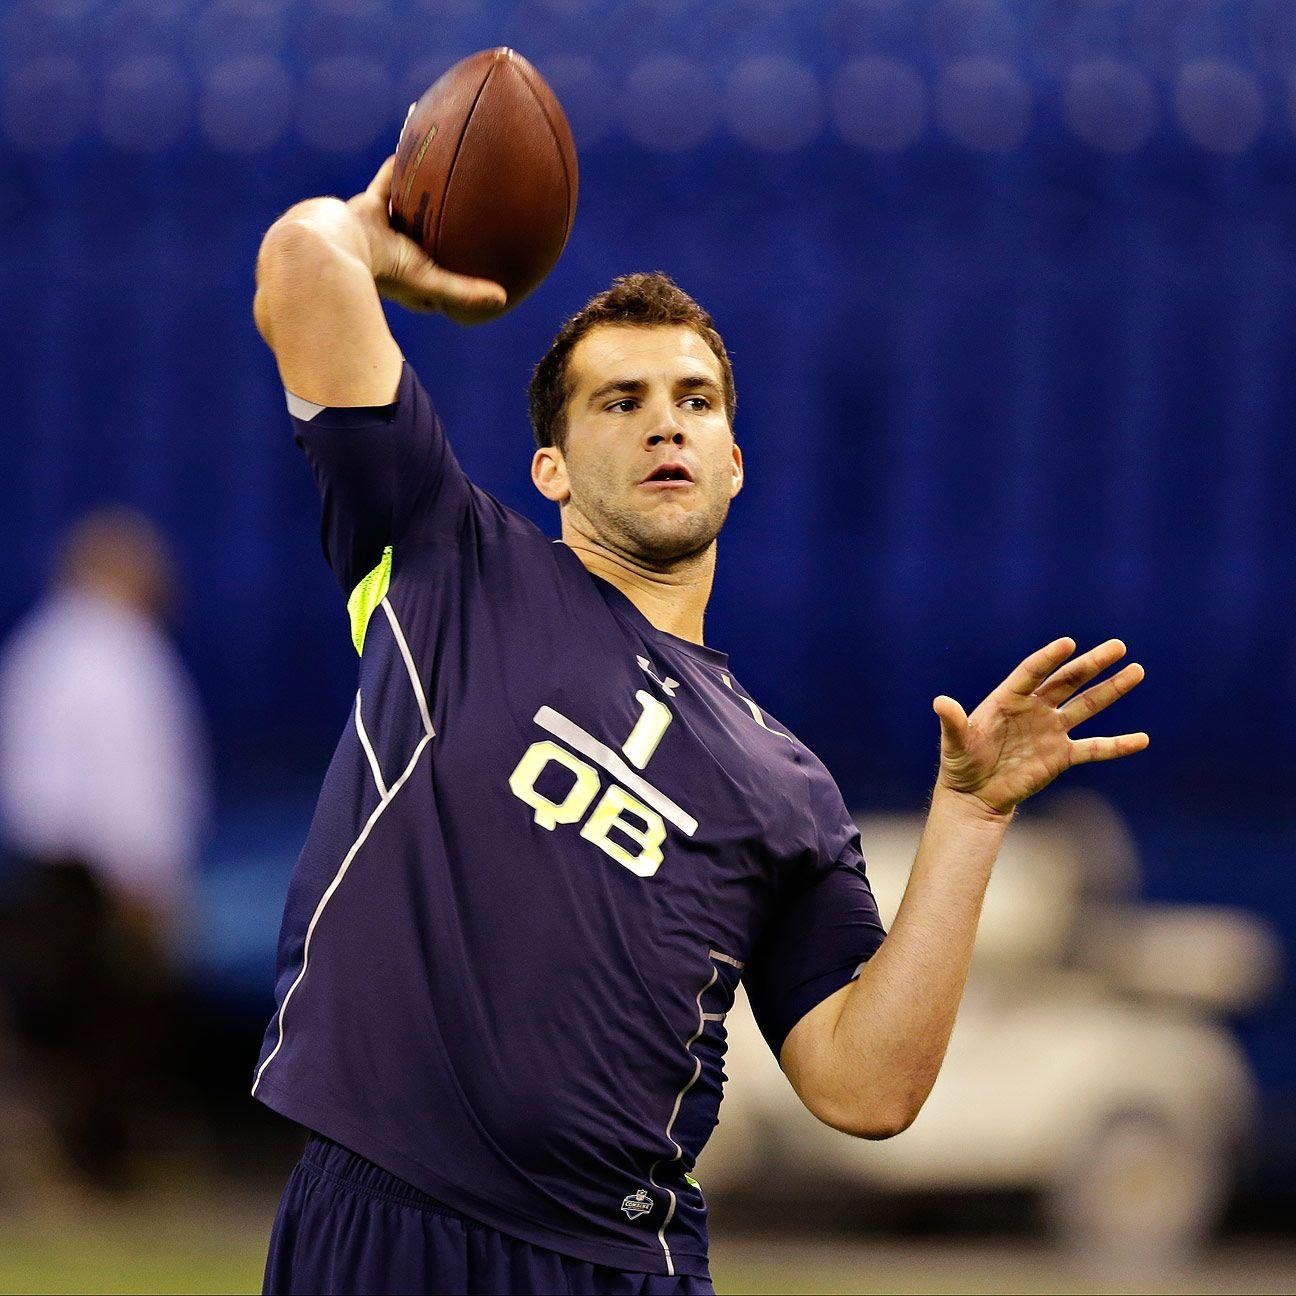 Blake Bortles poised for NFL success